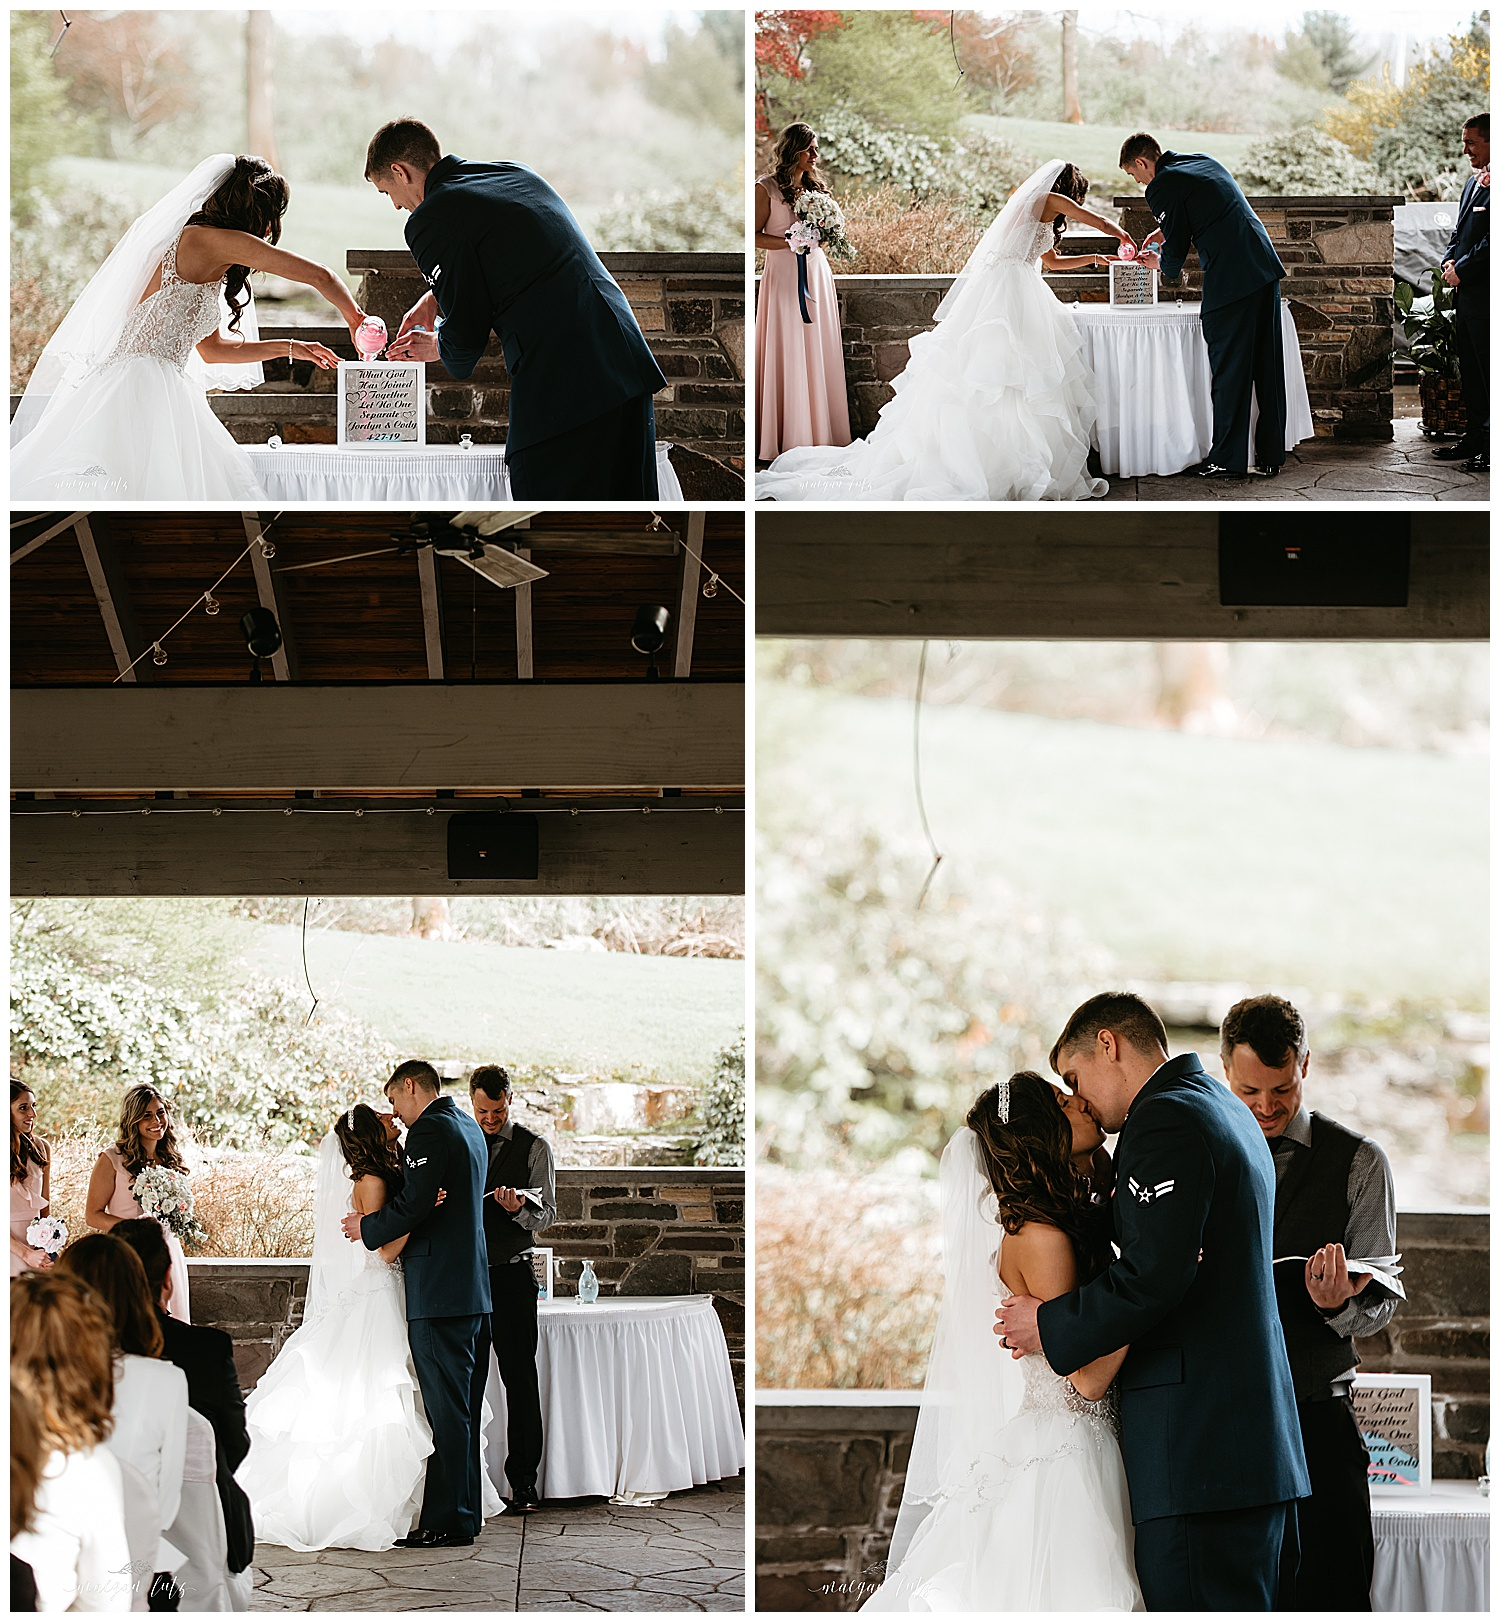 NEPA-Lehigh-Valley-Wedding-Photographer-at-Glen-Oak-Country-Club-Clarks-Summit-PA_0046.jpg